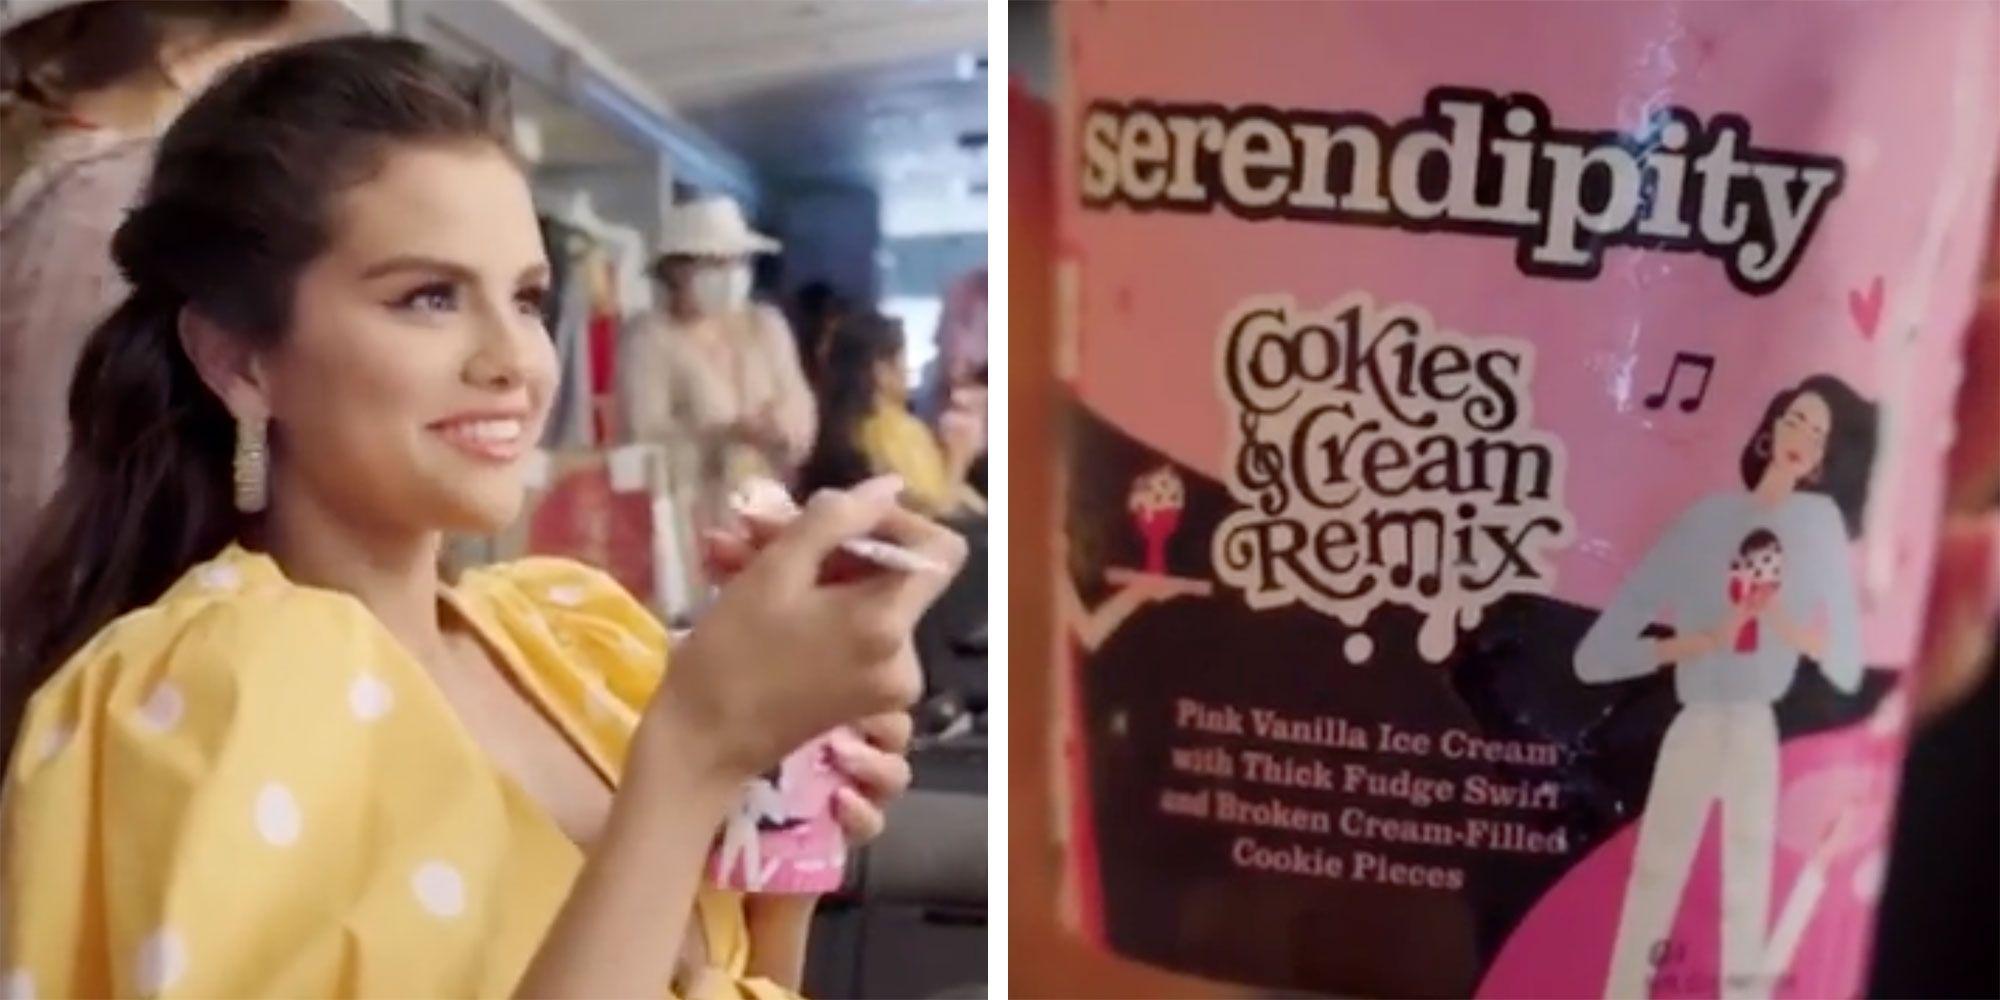 Selena Gomez Releases Serendipity Ice Cream Flavor To Honor Blackpink